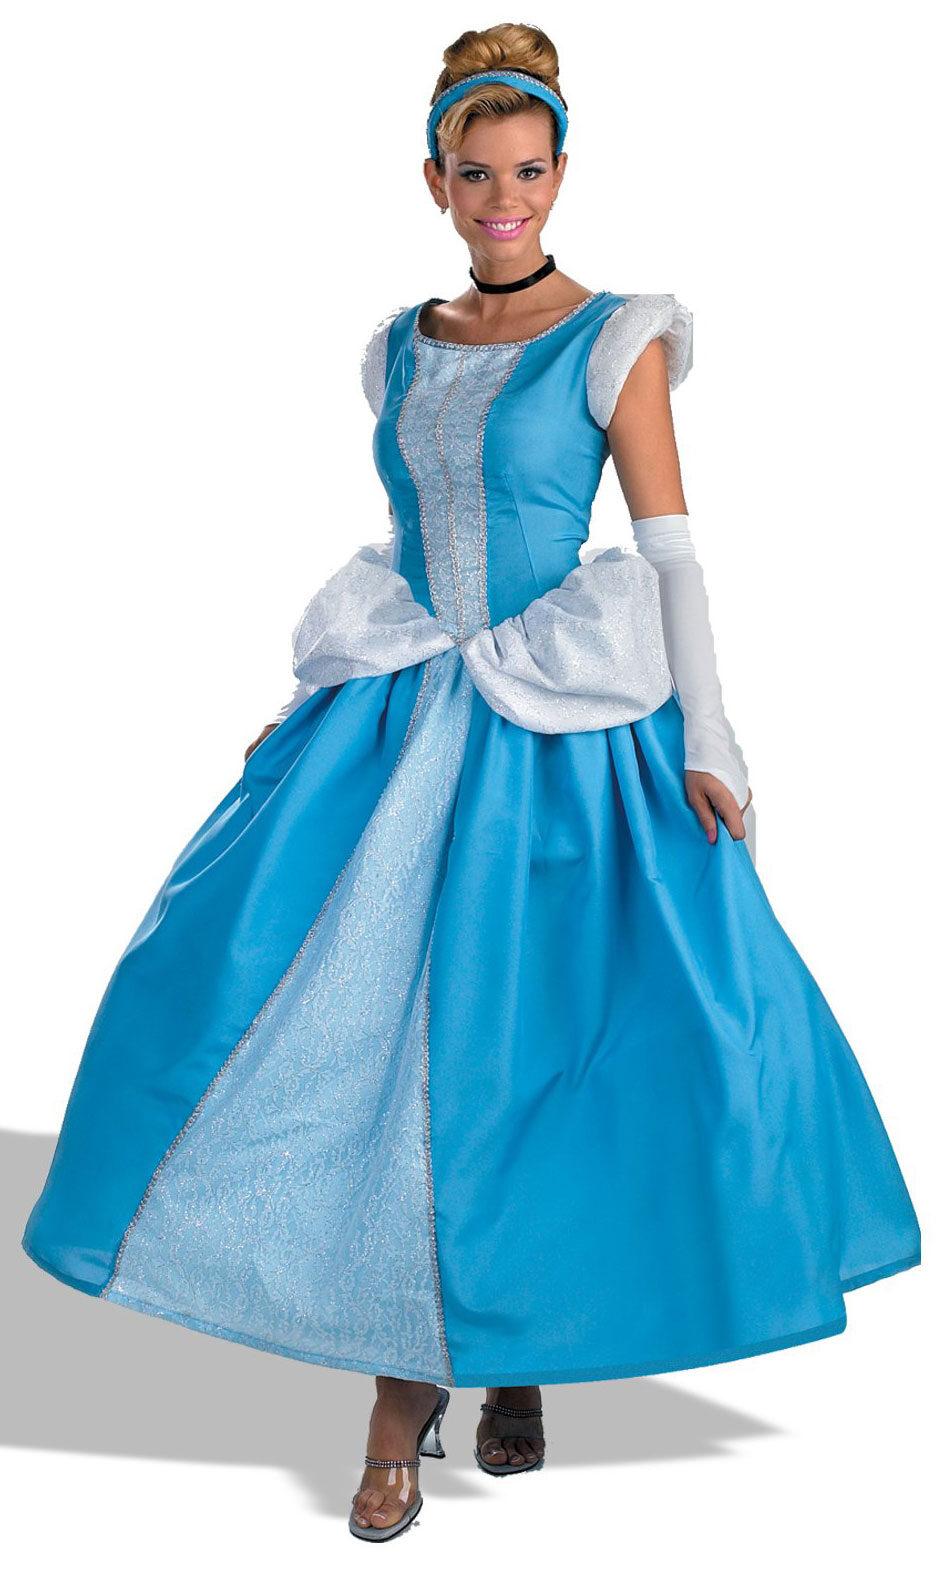 adult disney prestige princess cinderella costume mr. Black Bedroom Furniture Sets. Home Design Ideas